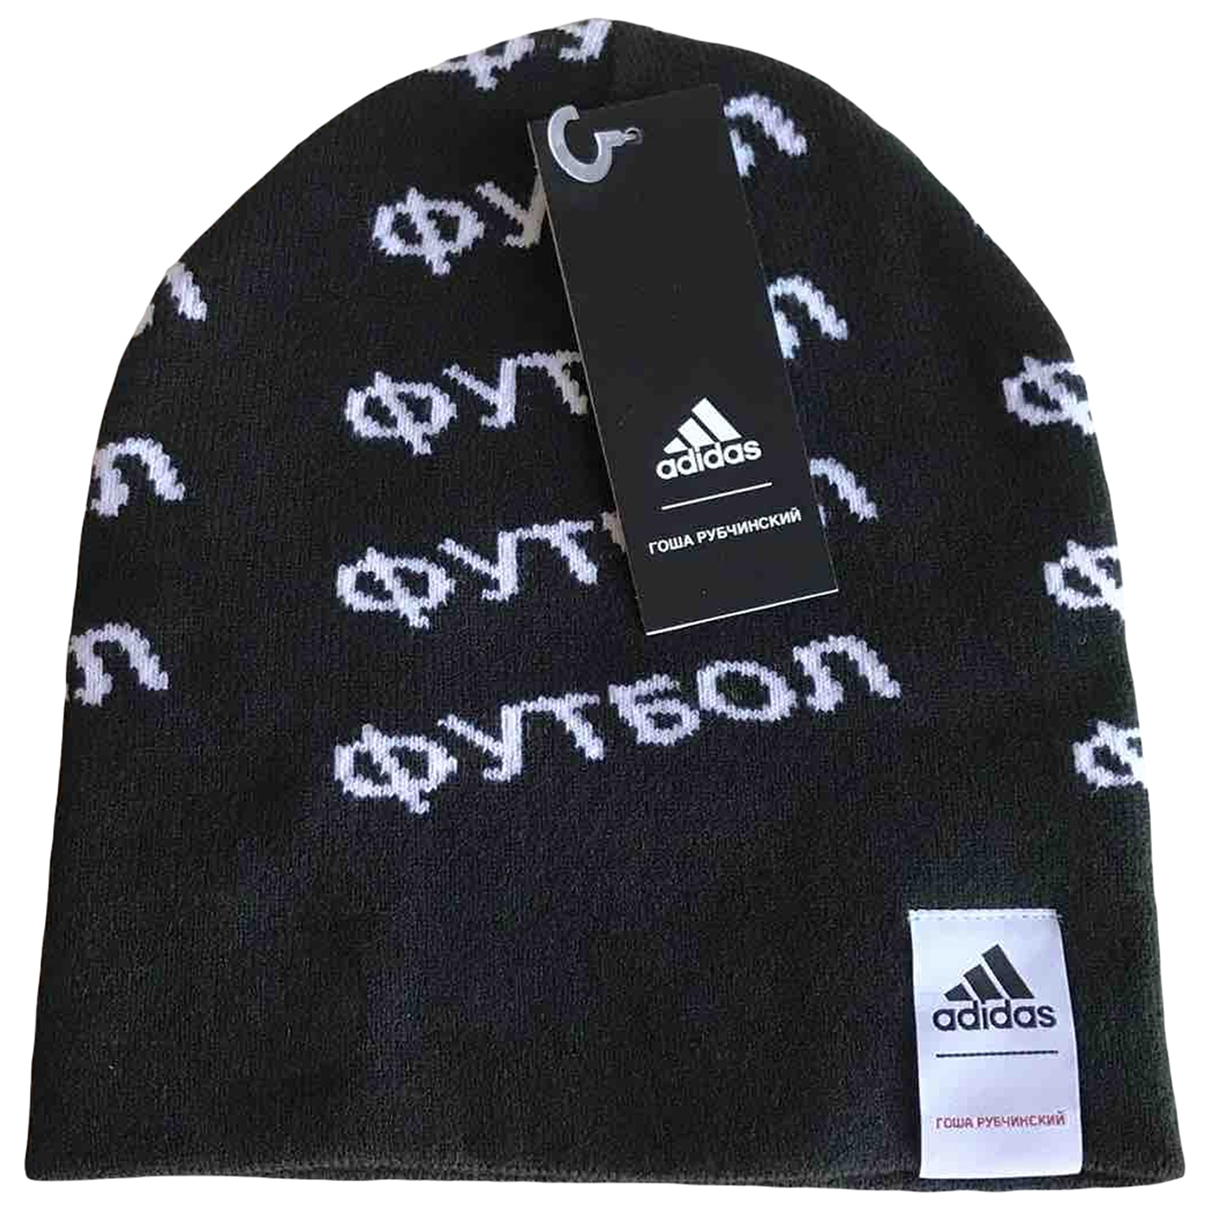 Adidas X Gosha Rubchinskiy N Black hat & pull on hat for Men M International